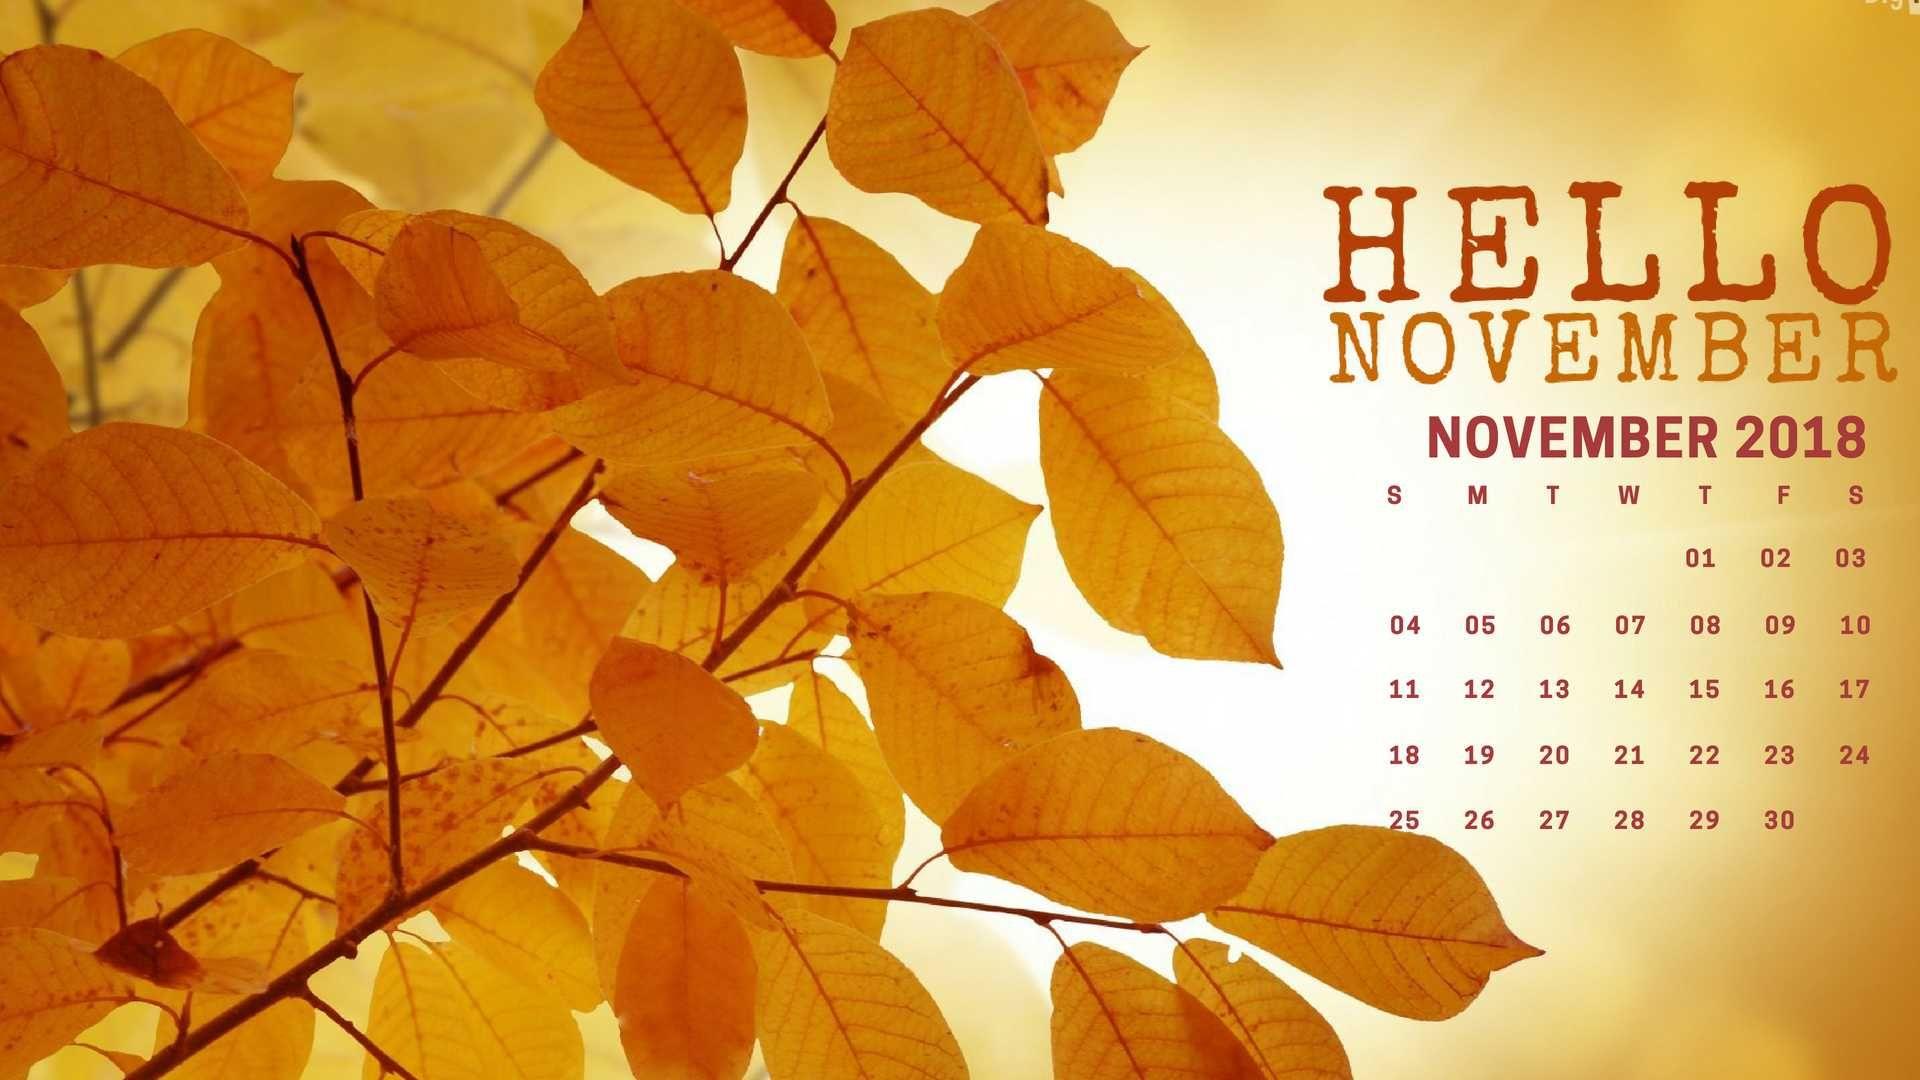 Hello November 2018 Calendar Wallpaper Desktop Background